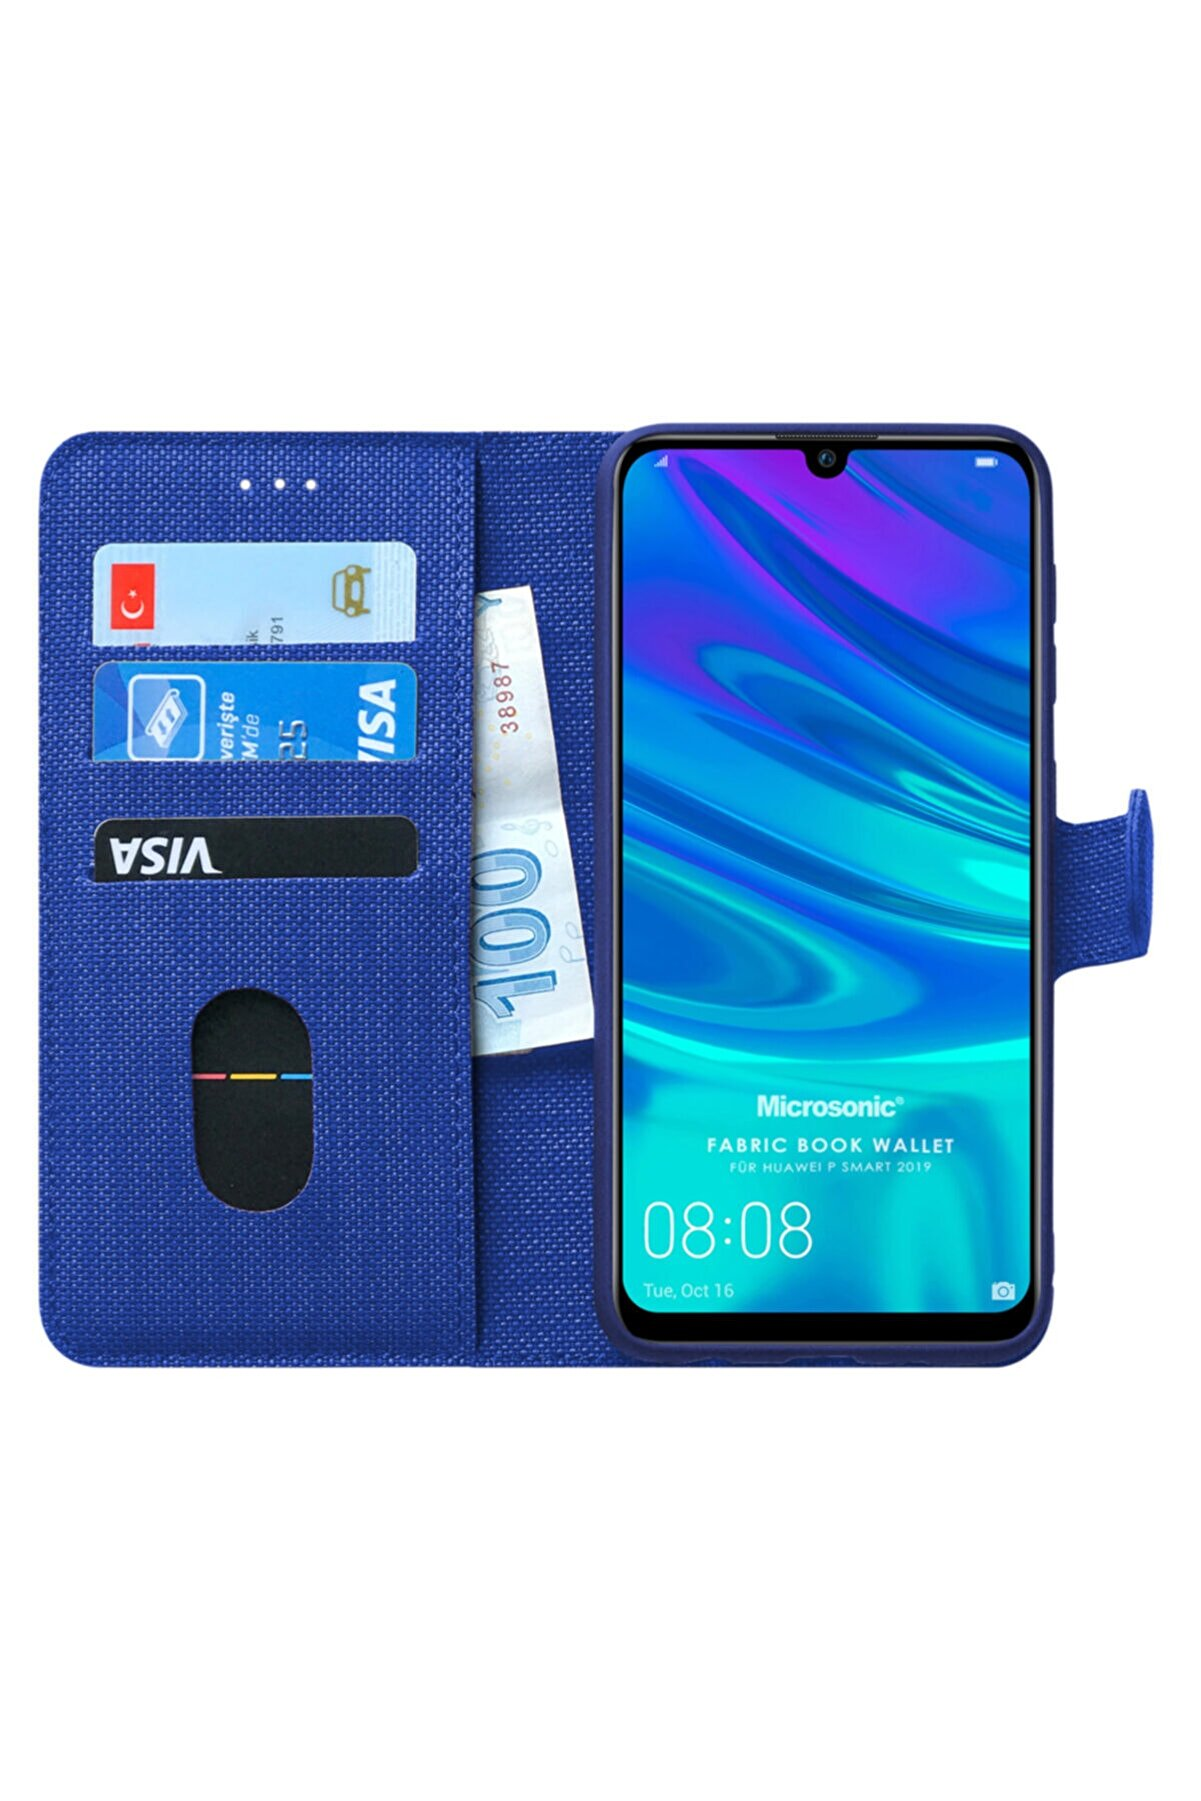 Microsonic P Smart 2019 Kılıf, Microsonic Fabric Book Wallet